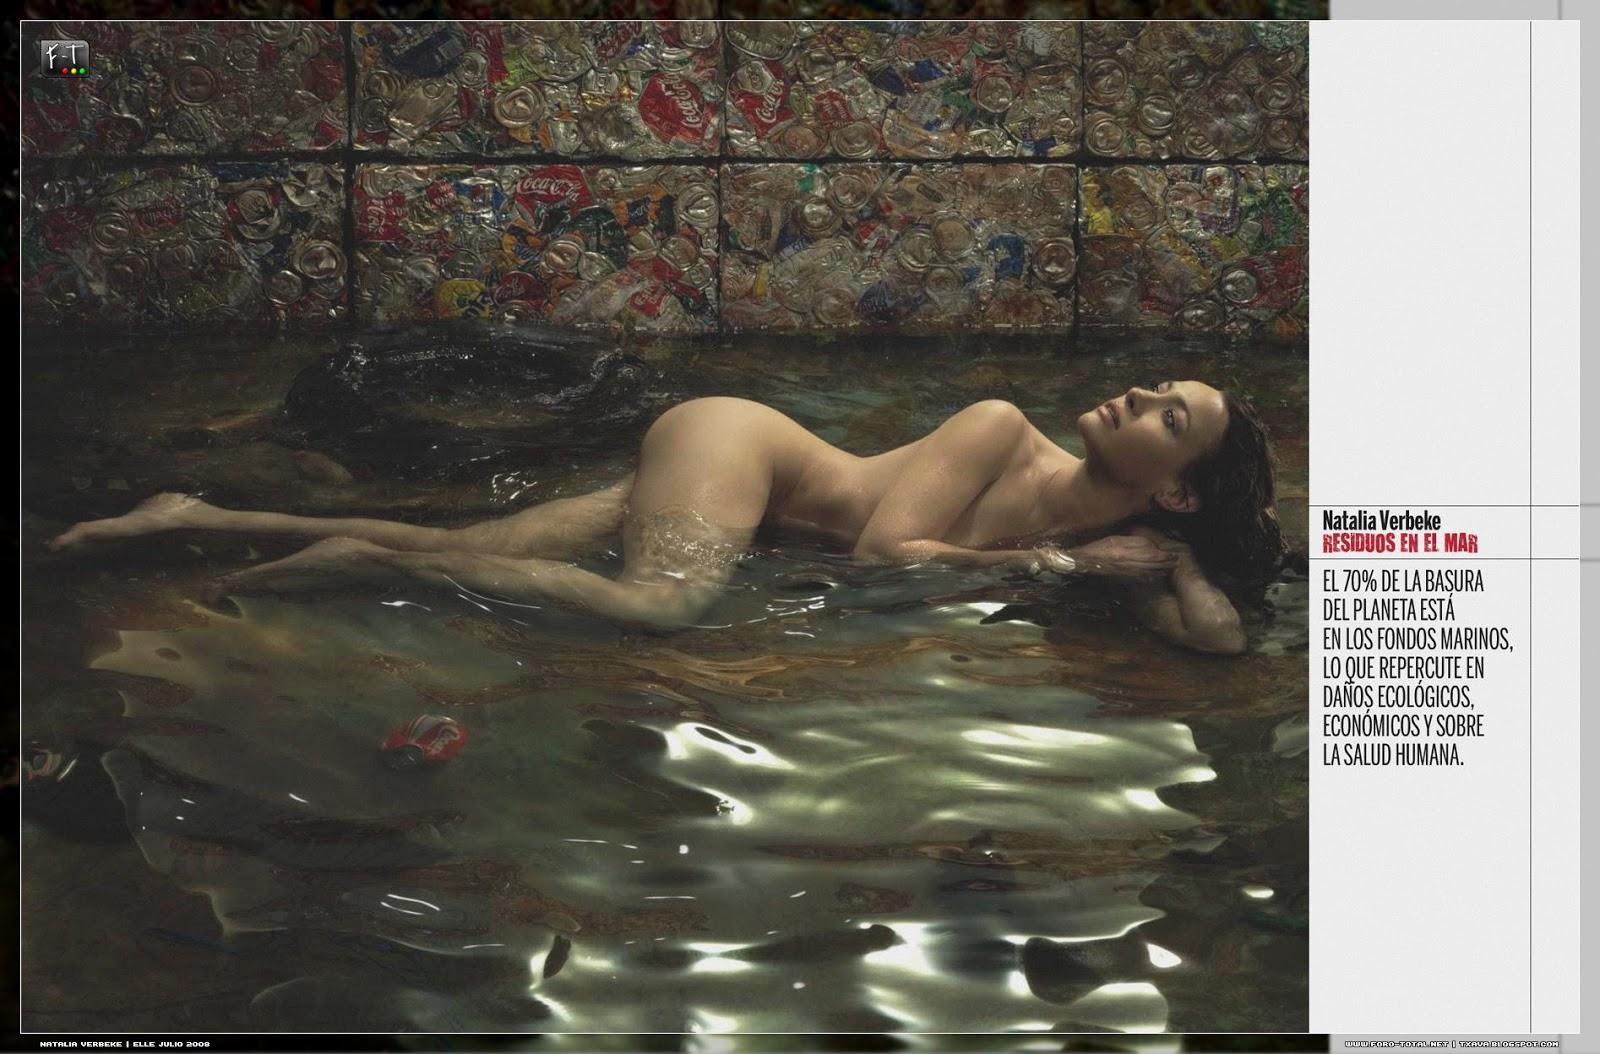 Natalia Verbeke Desnuda fakes : natalia verbeke (desnuda) (11)